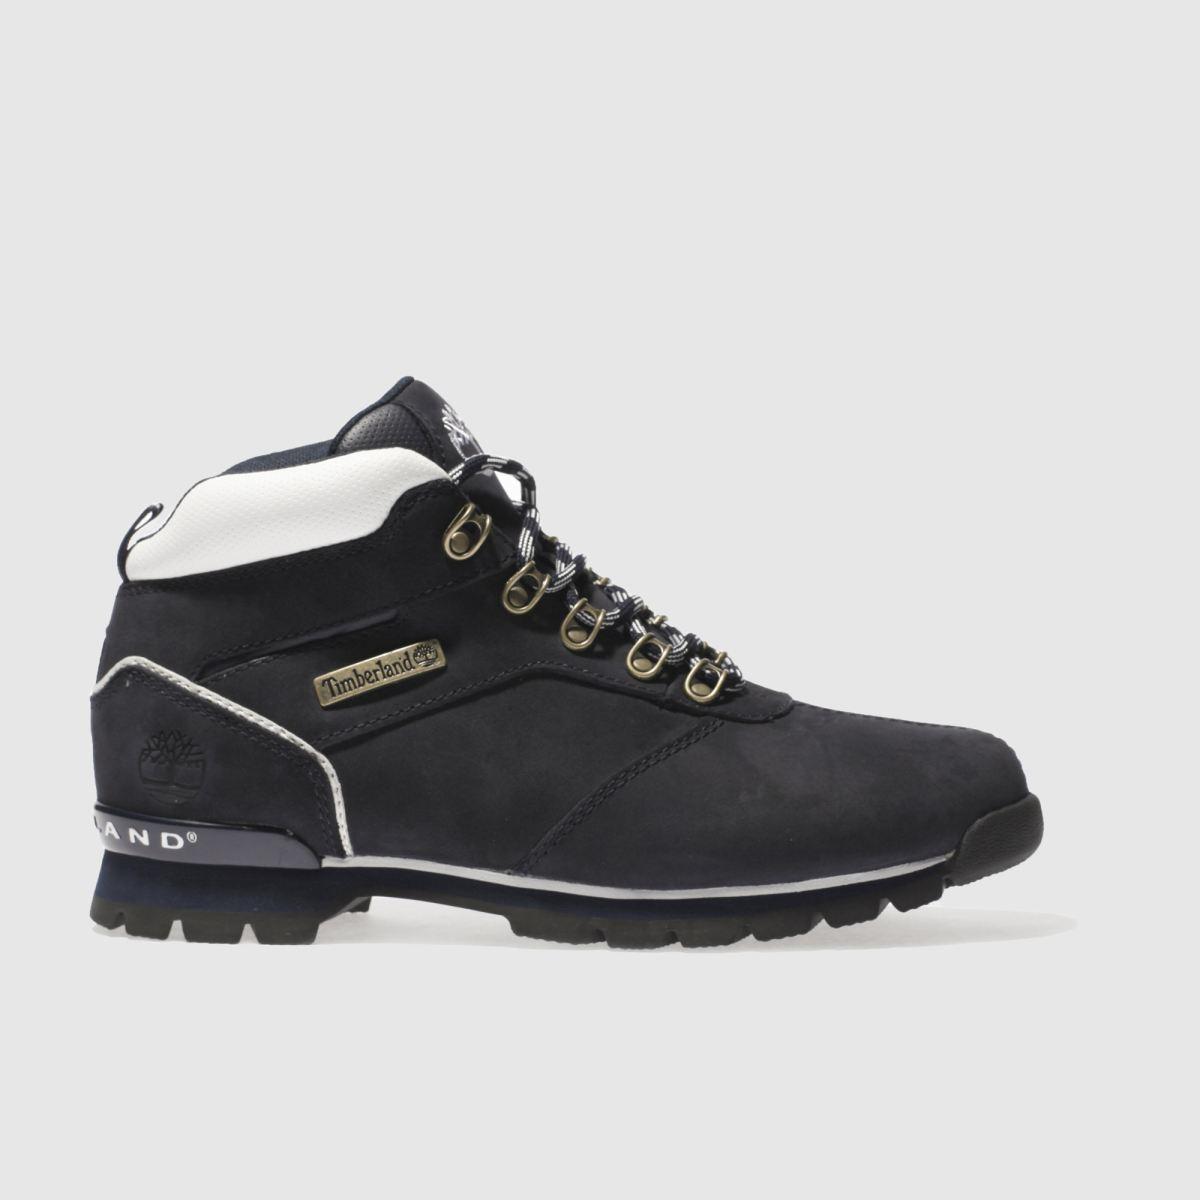 Timberland Navy Splitrock Boots